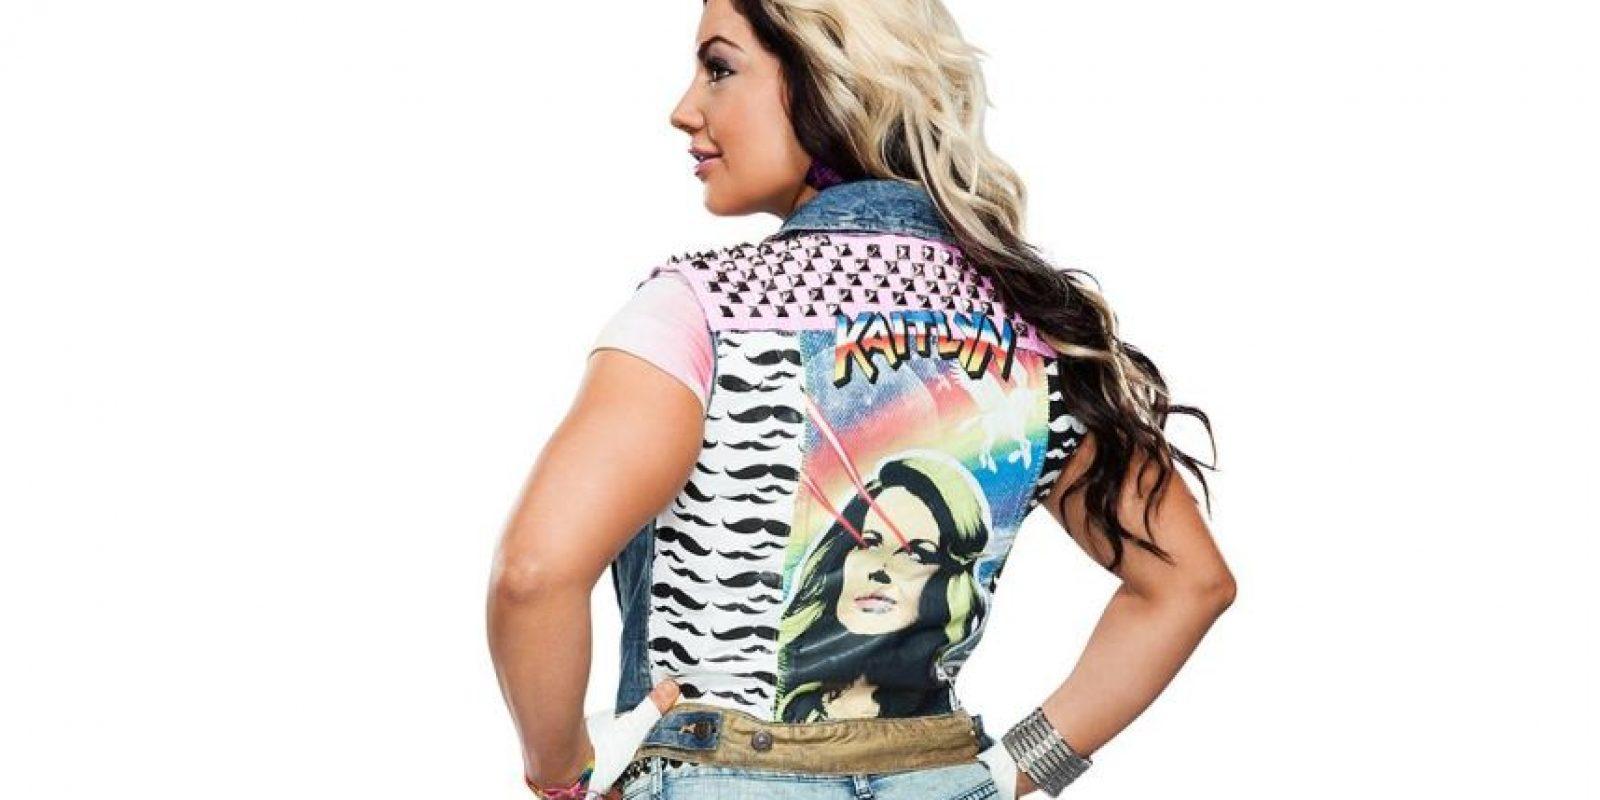 Kaitlyn Foto:WWE